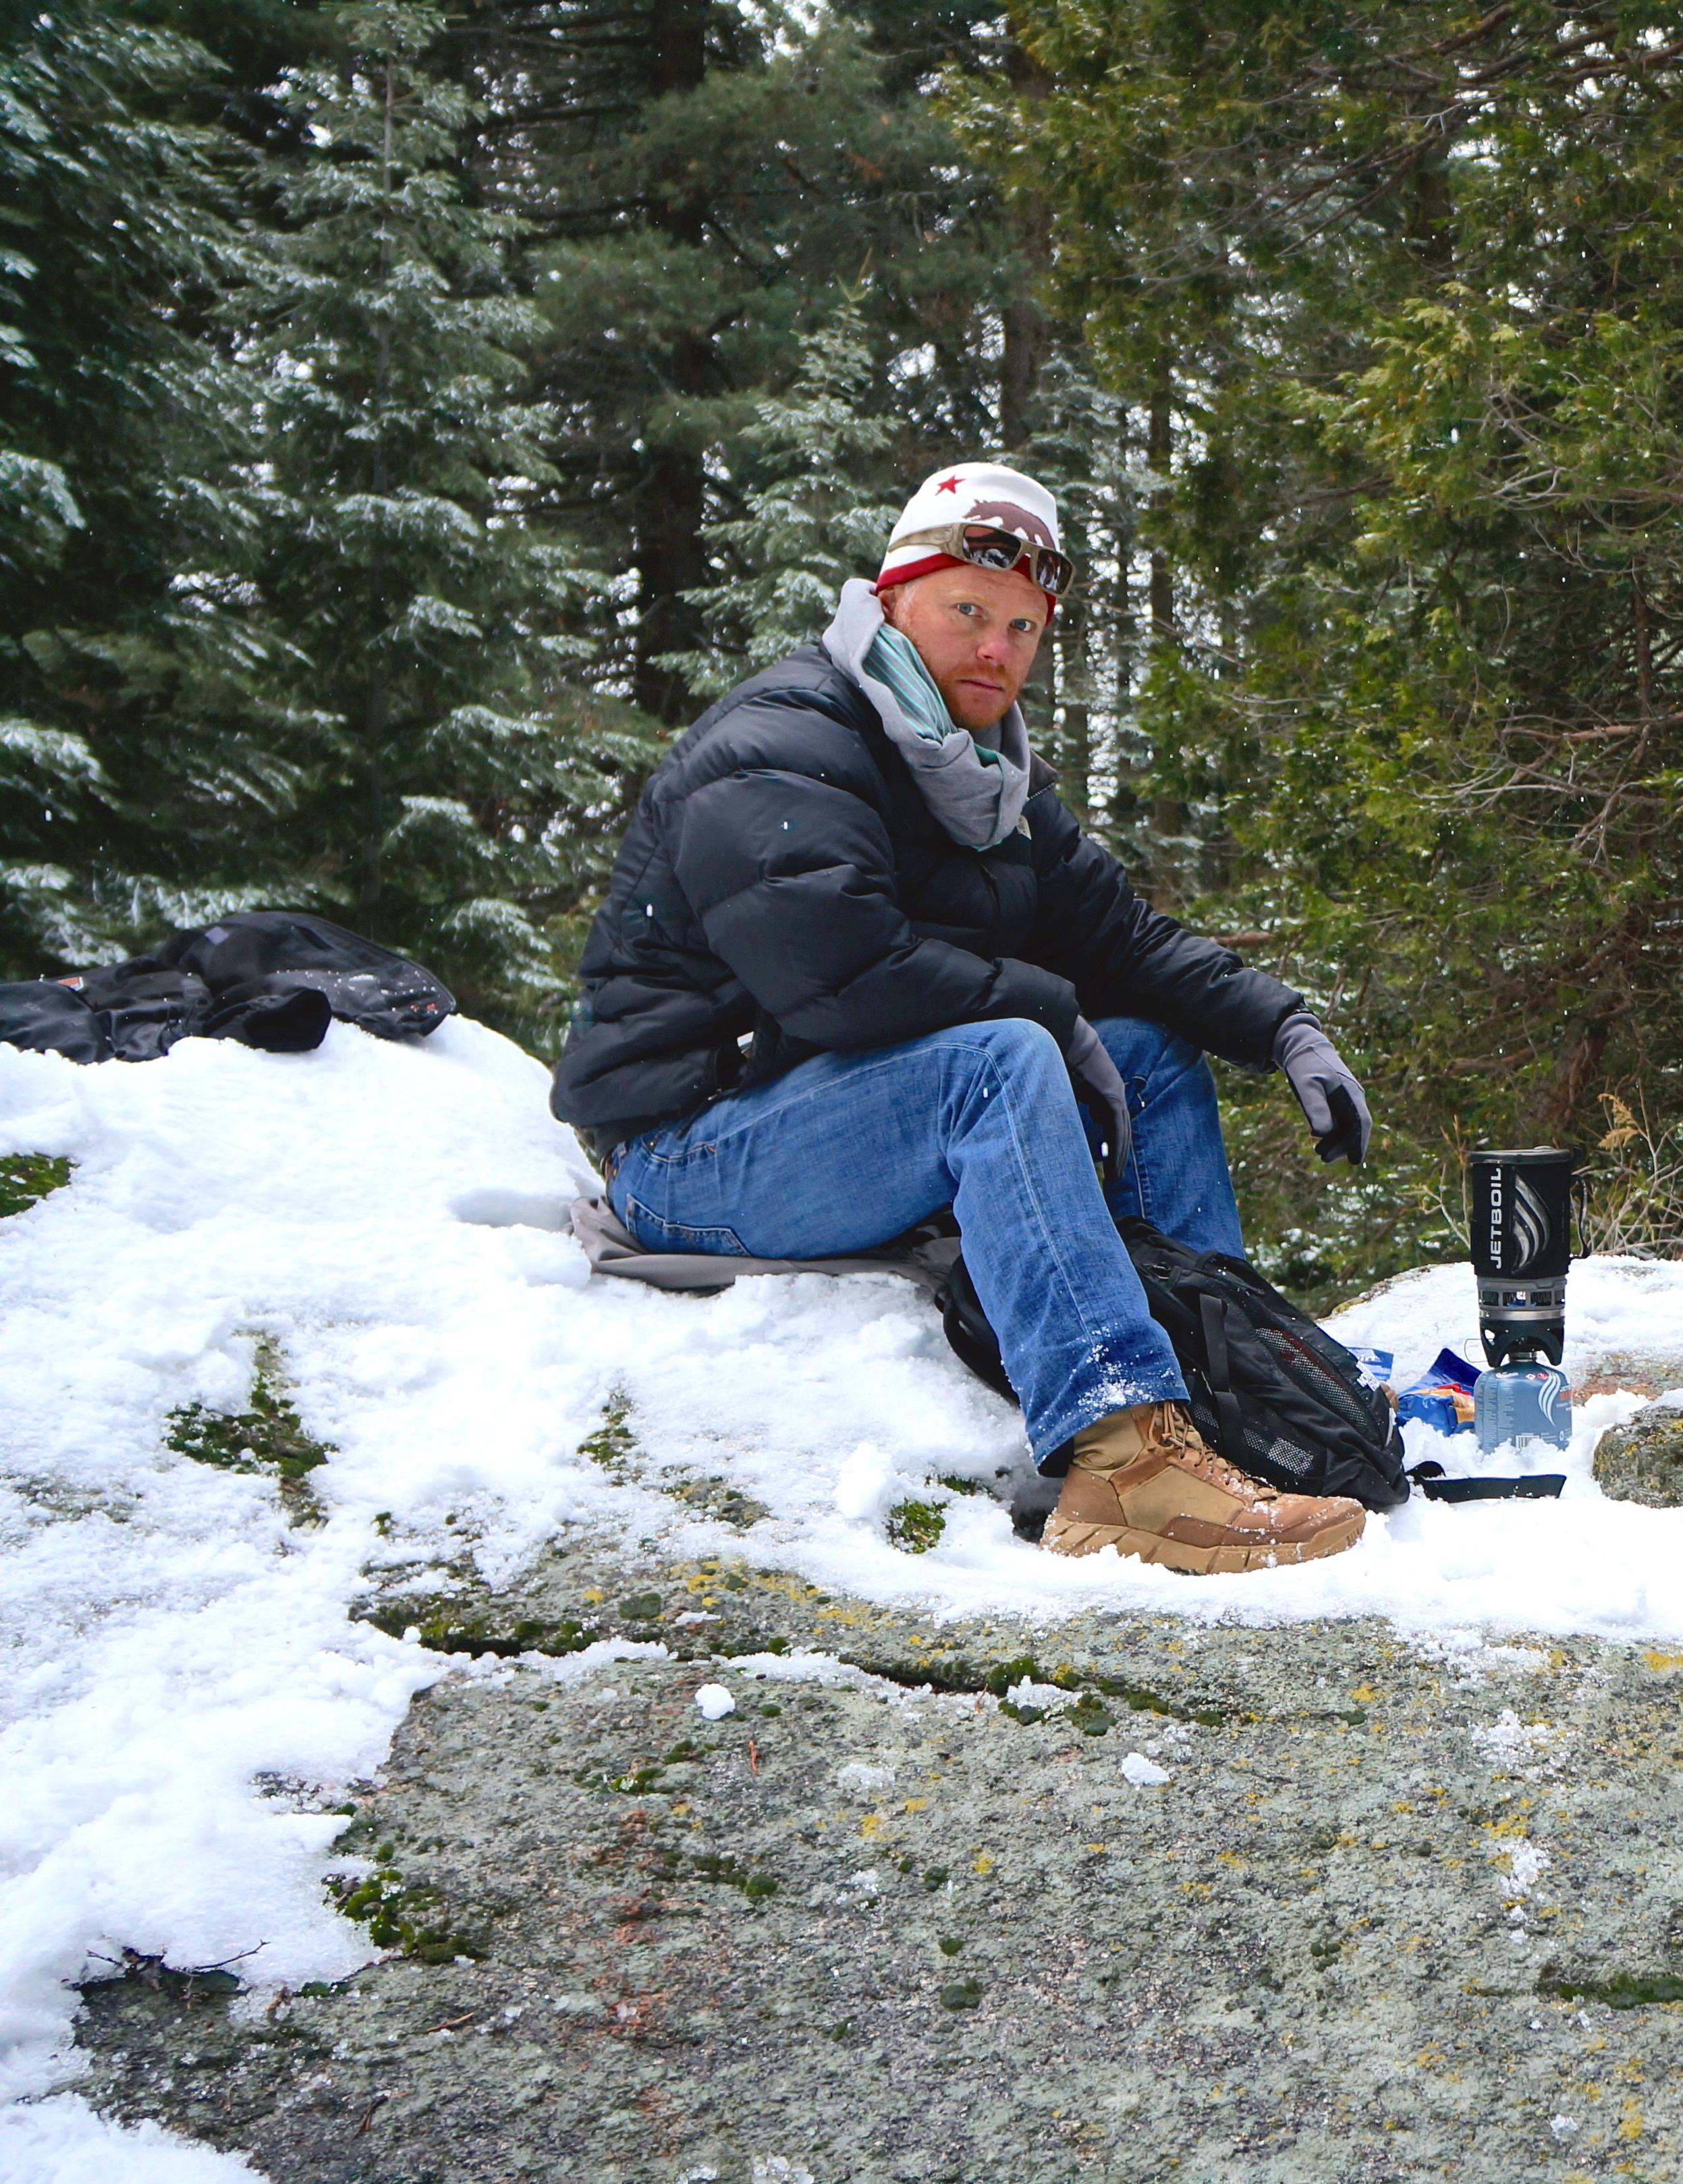 Average Oakley assault boot eric california sequoias snow outdoors 2015-02-28 13.06.34 (1).jpg